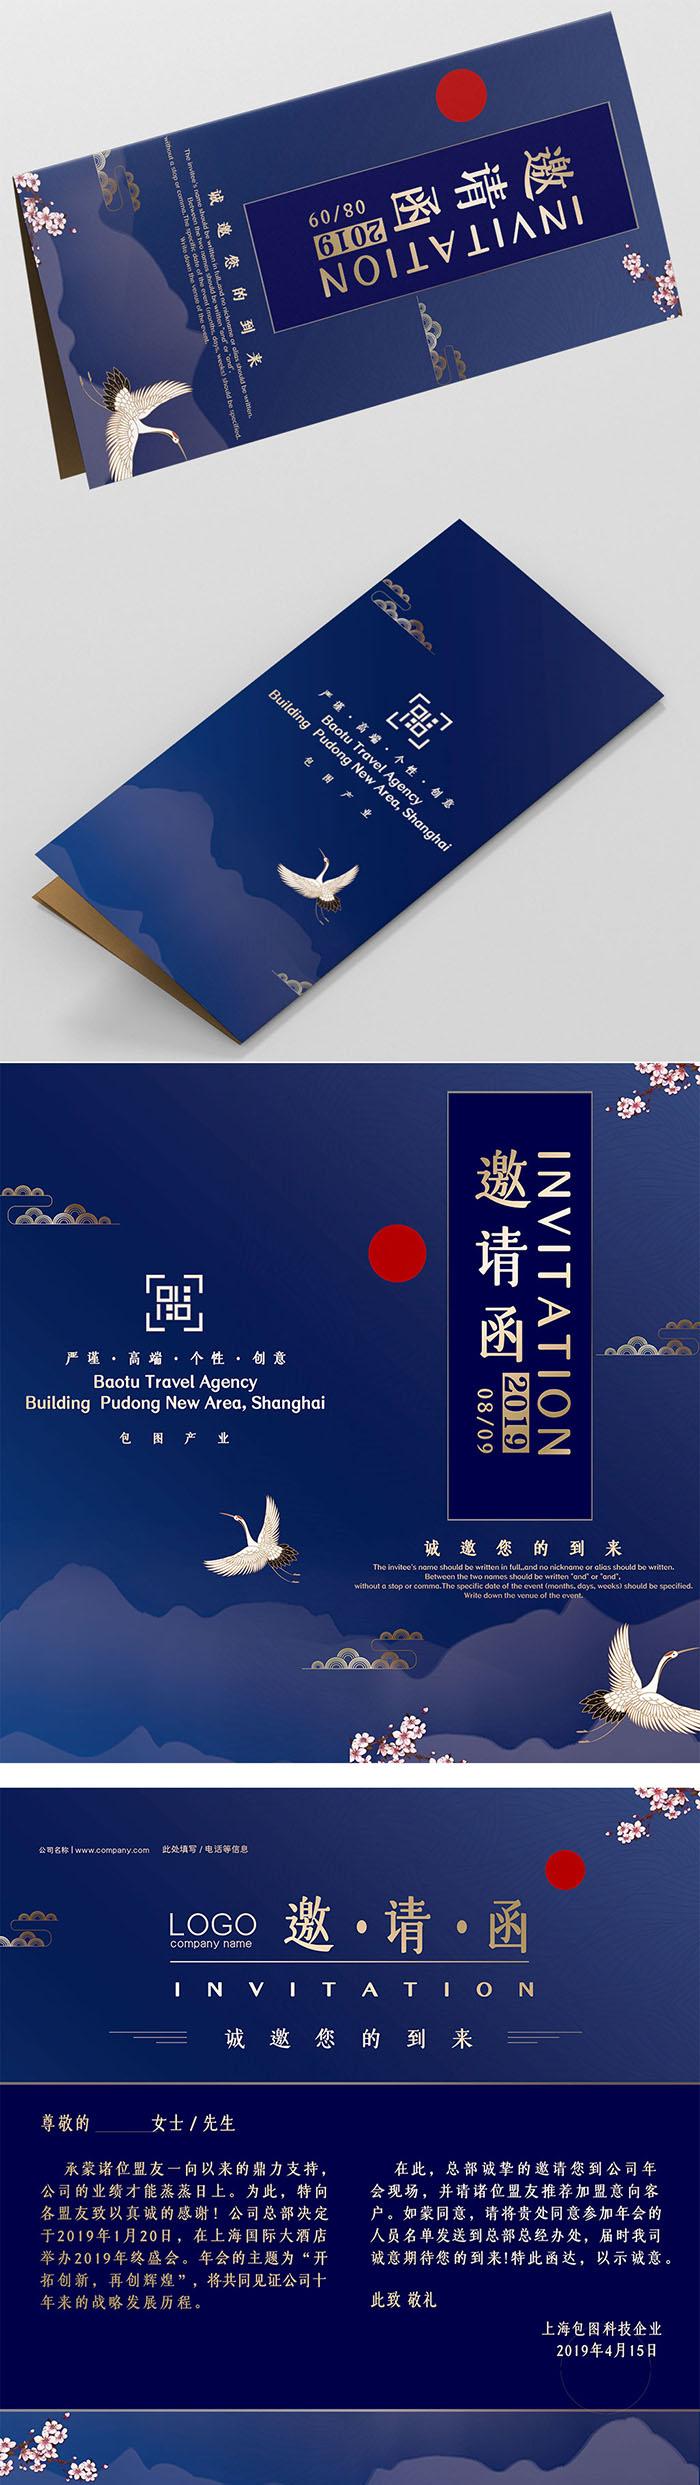 Exquisite Dark Blue Chinese Crane Red Sun Element Bronzing Invitation